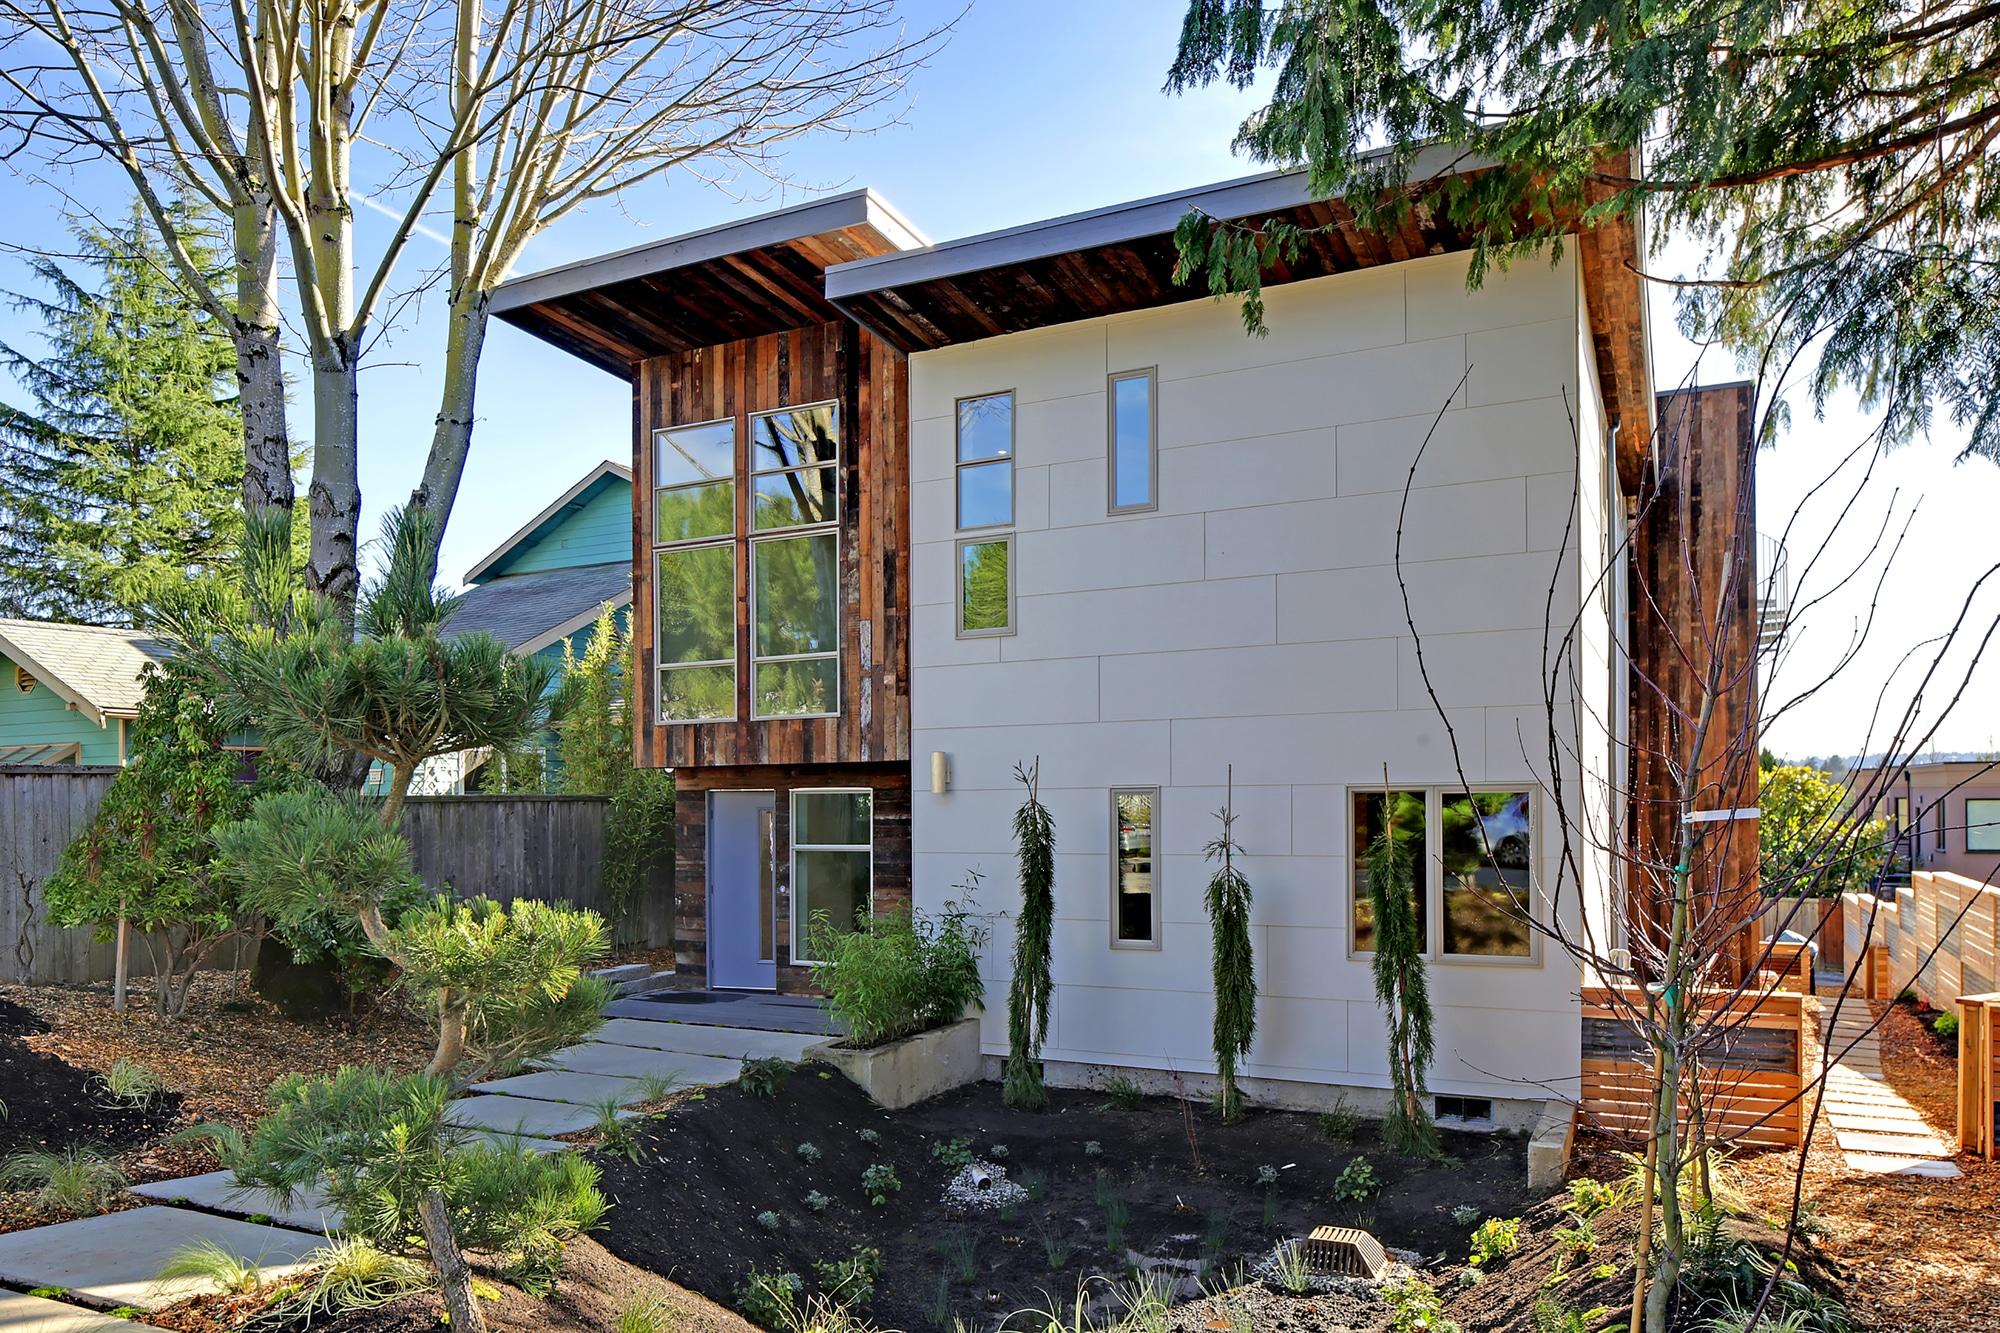 Dise o casa ecol gica autosuficiente planos construye - Casas ecologicas de madera ...